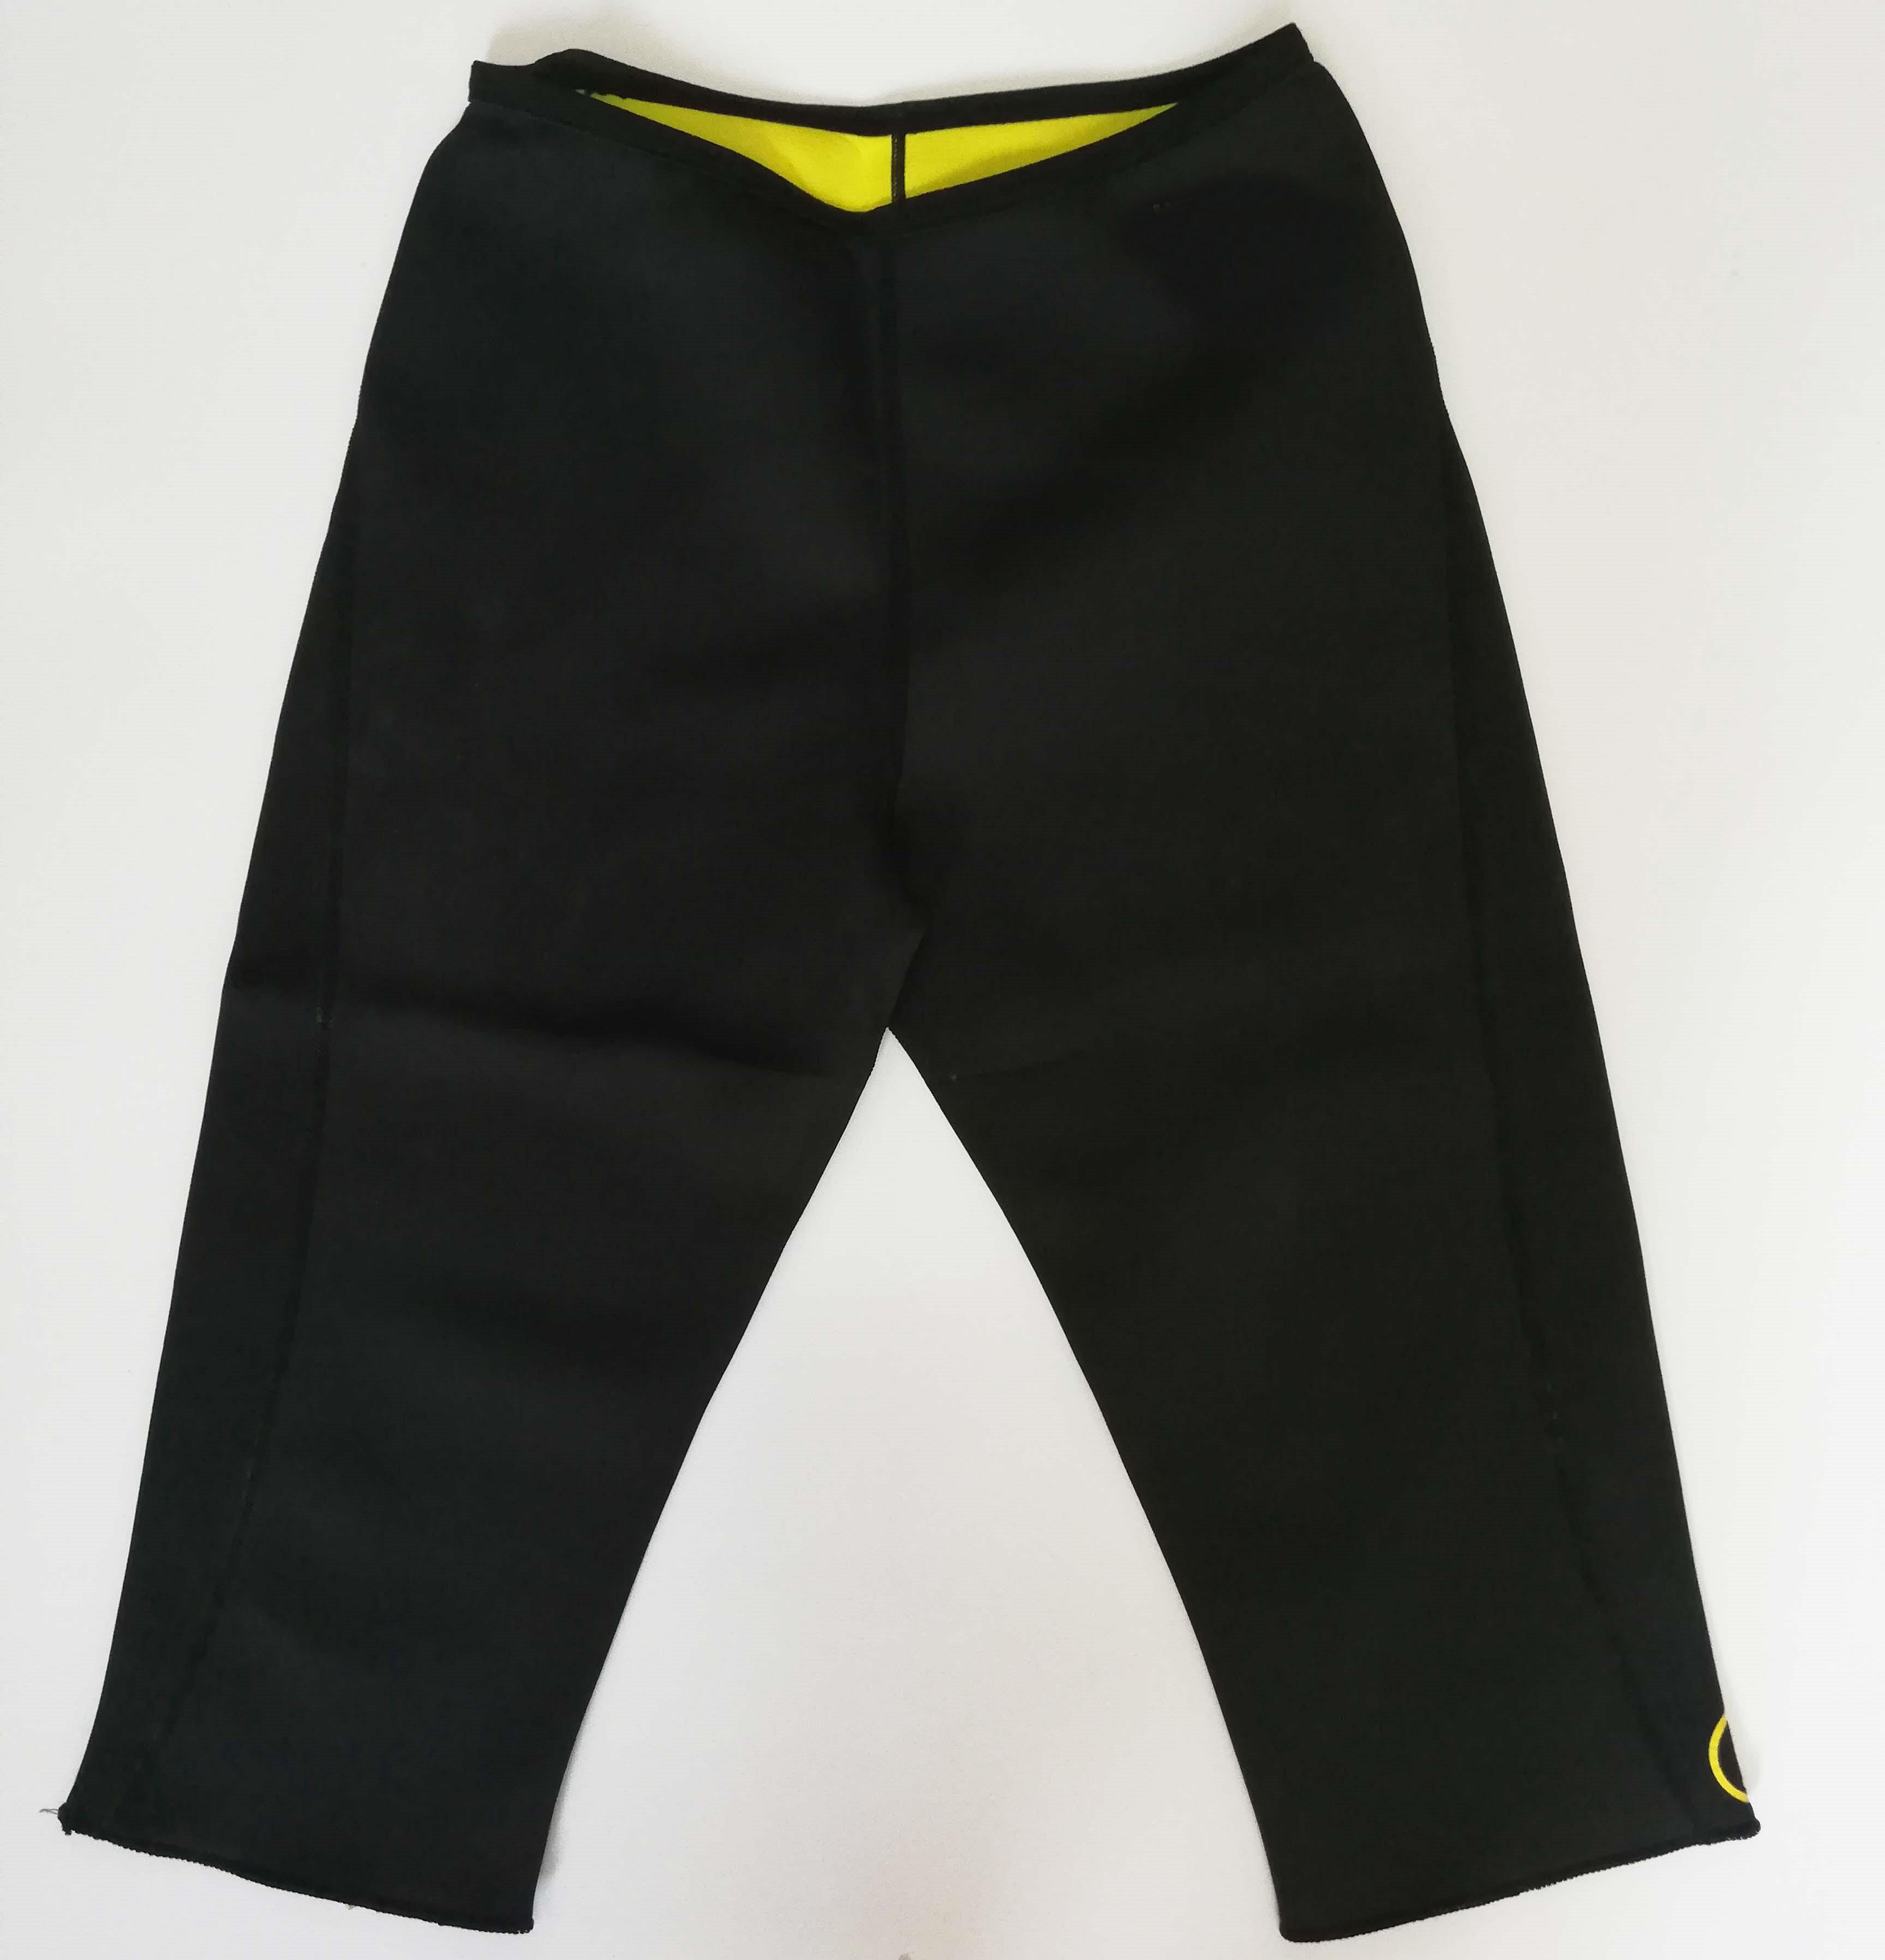 fcf7b1ed5 China body shaping pants wholesale 🇨🇳 - Alibaba